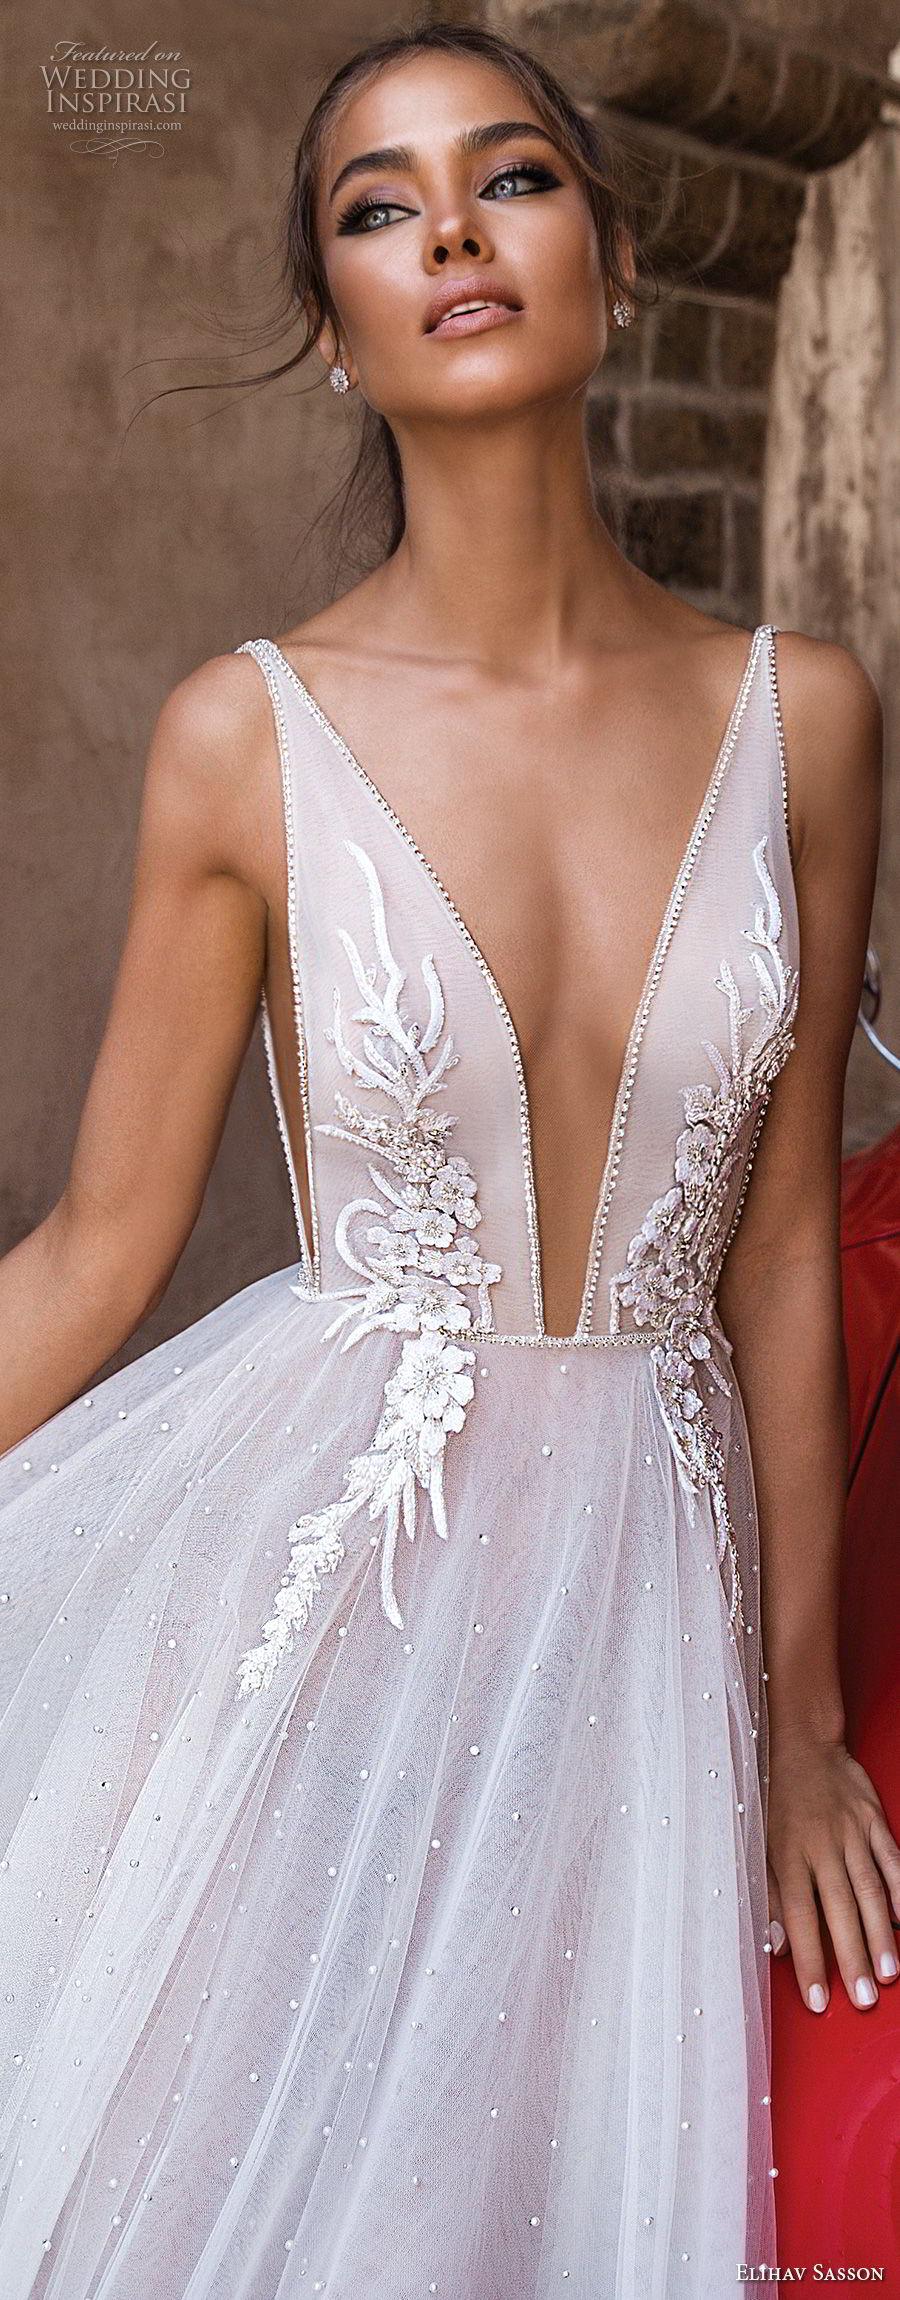 elihav sasson 2018 capsule bridal sleeveless deep plunging v neck heavily embellished bodice tulle skirt romantic soft a line wedding dress chapel train (1) zv